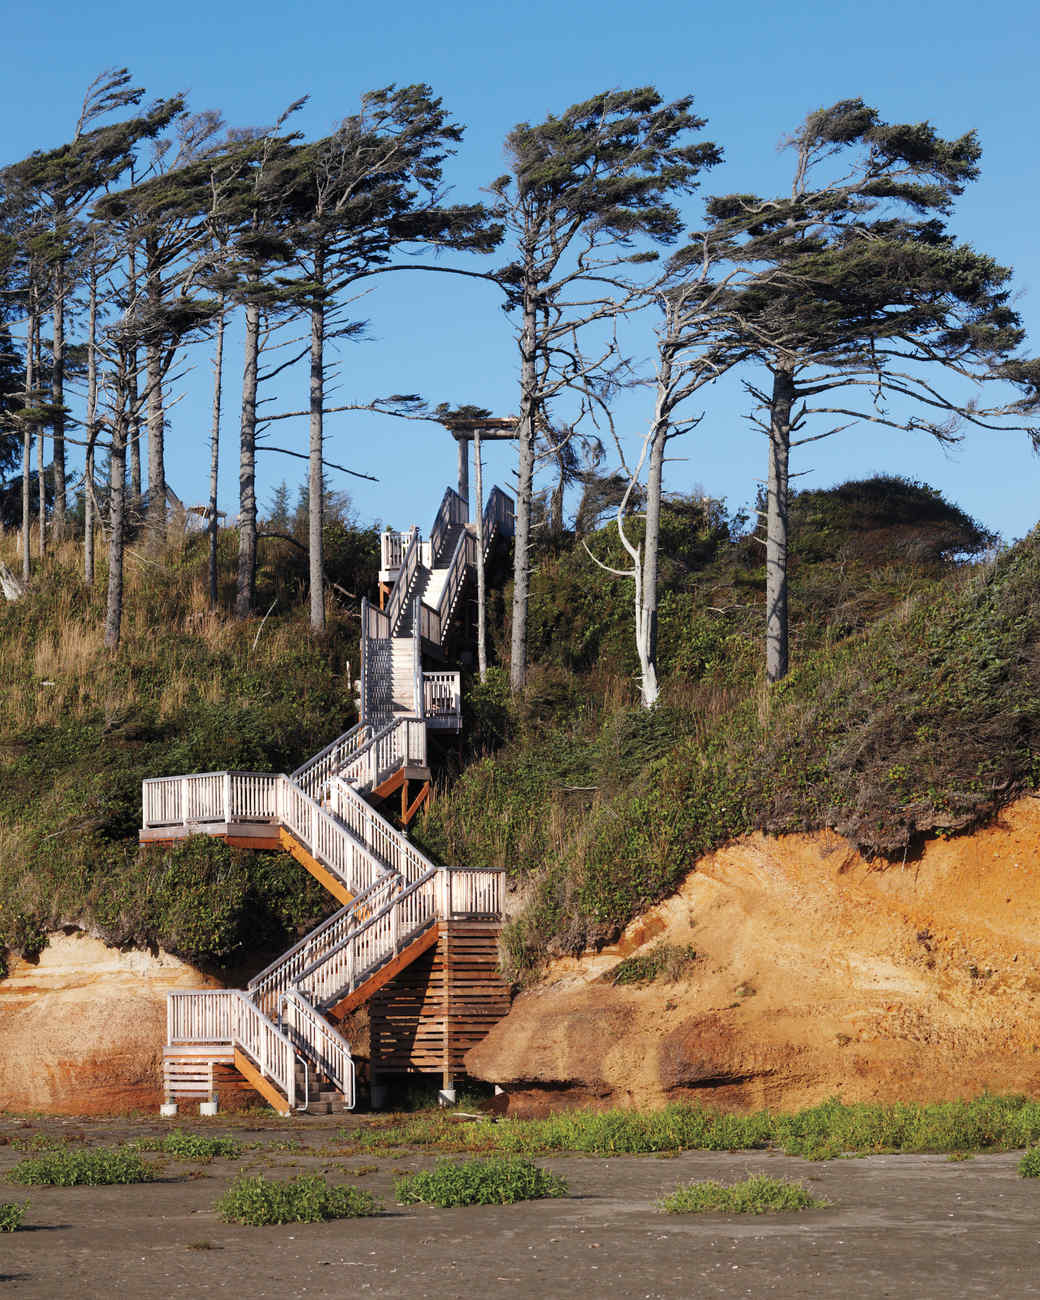 seabrook-beach-stairs-ms109960.jpg